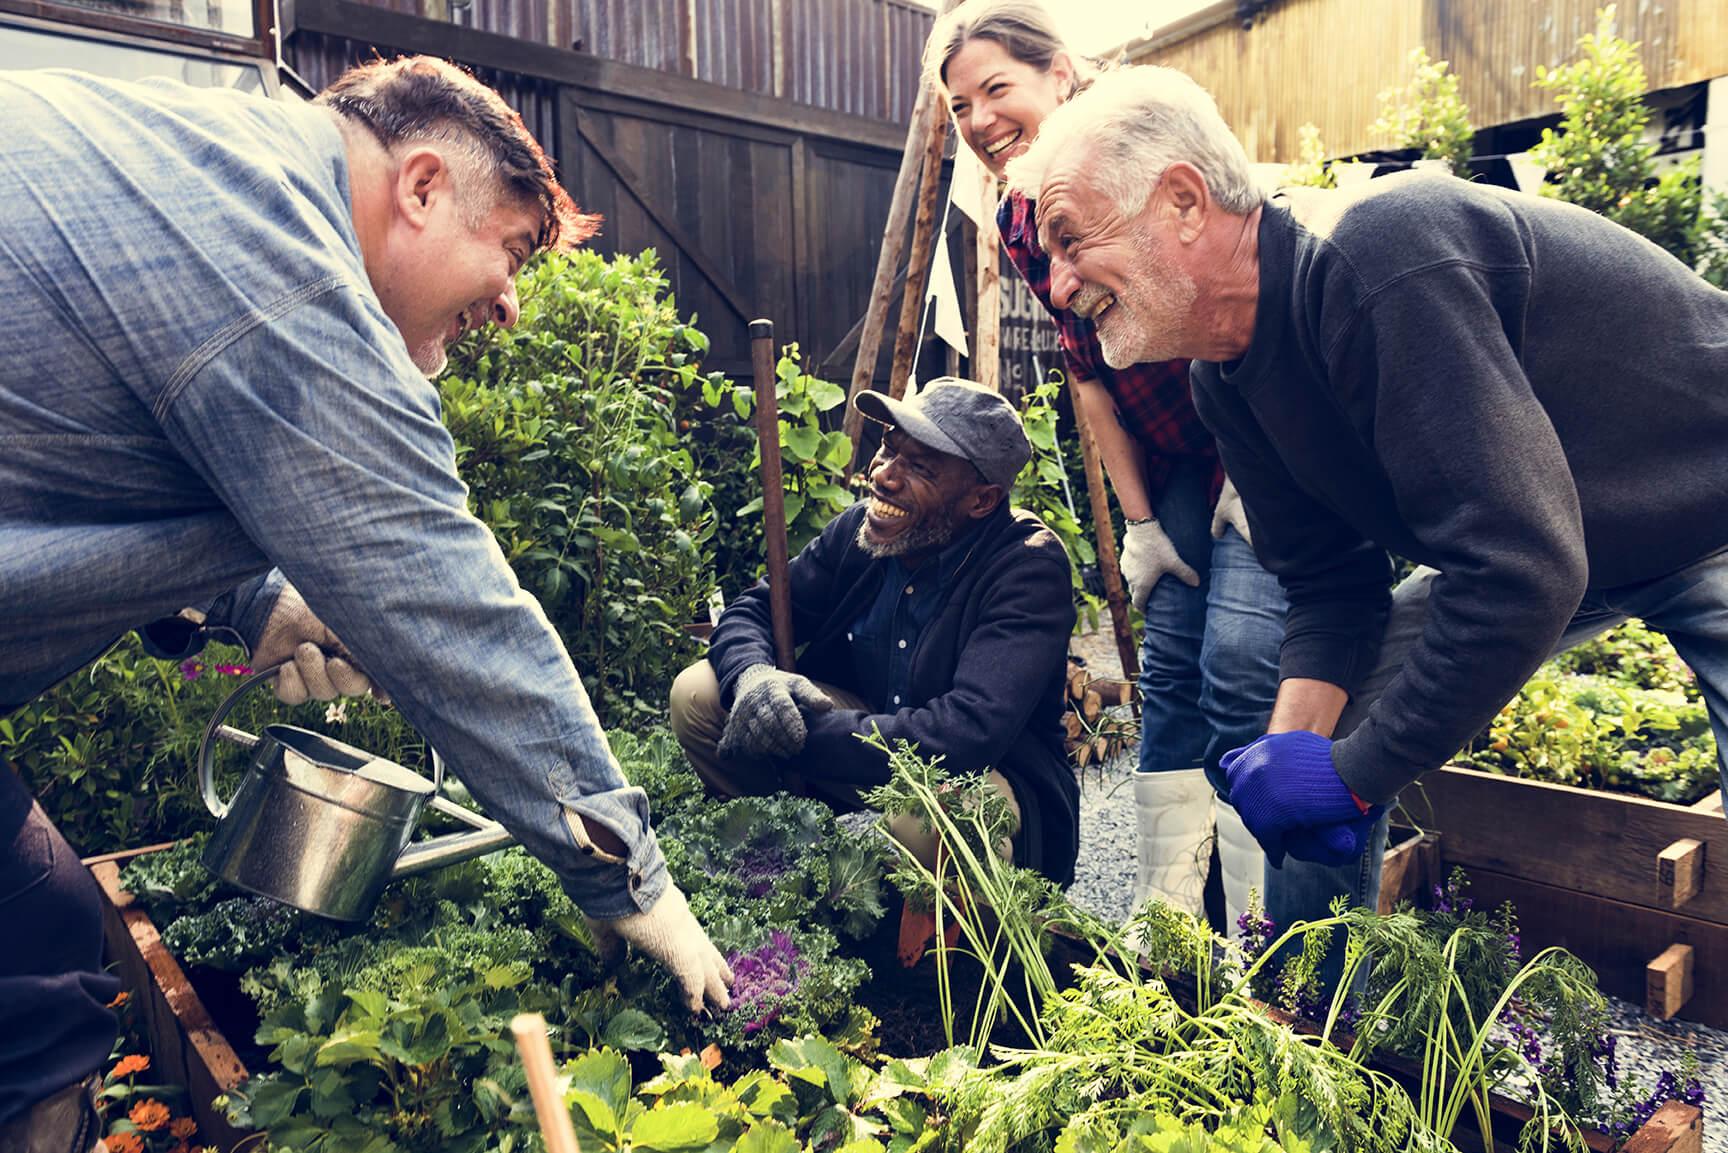 Gardening community